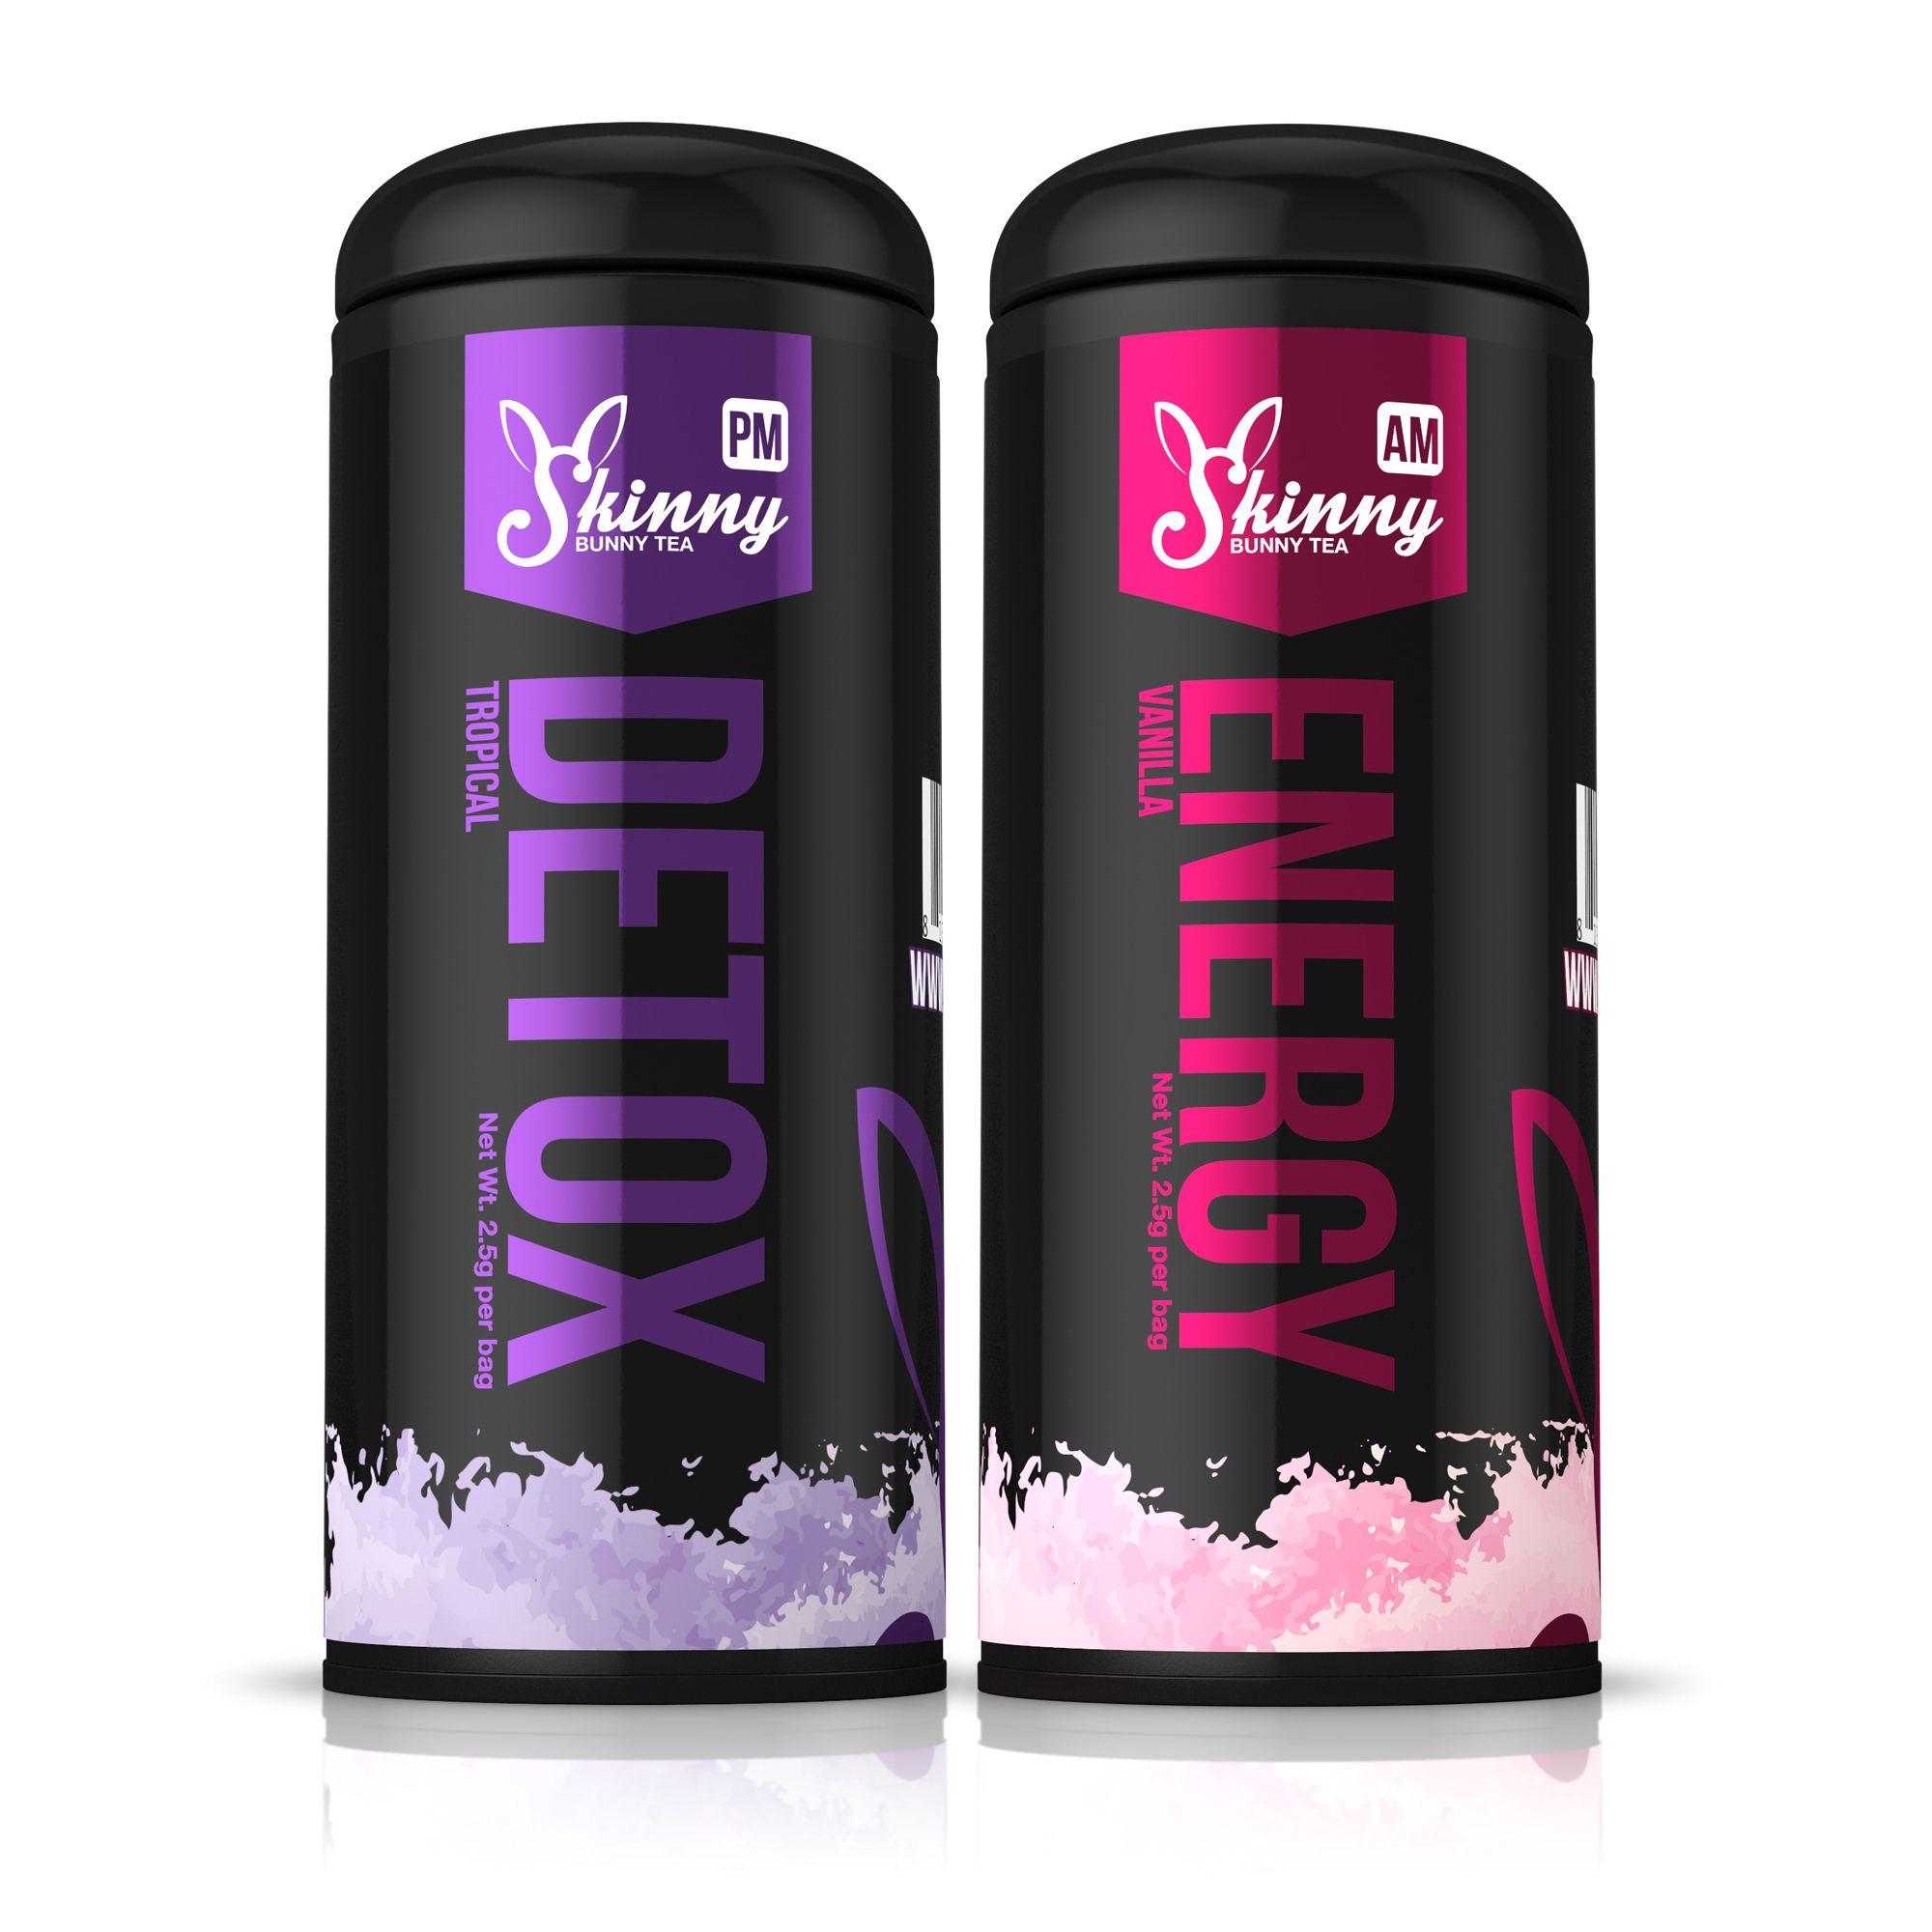 skinny fit detox tea results